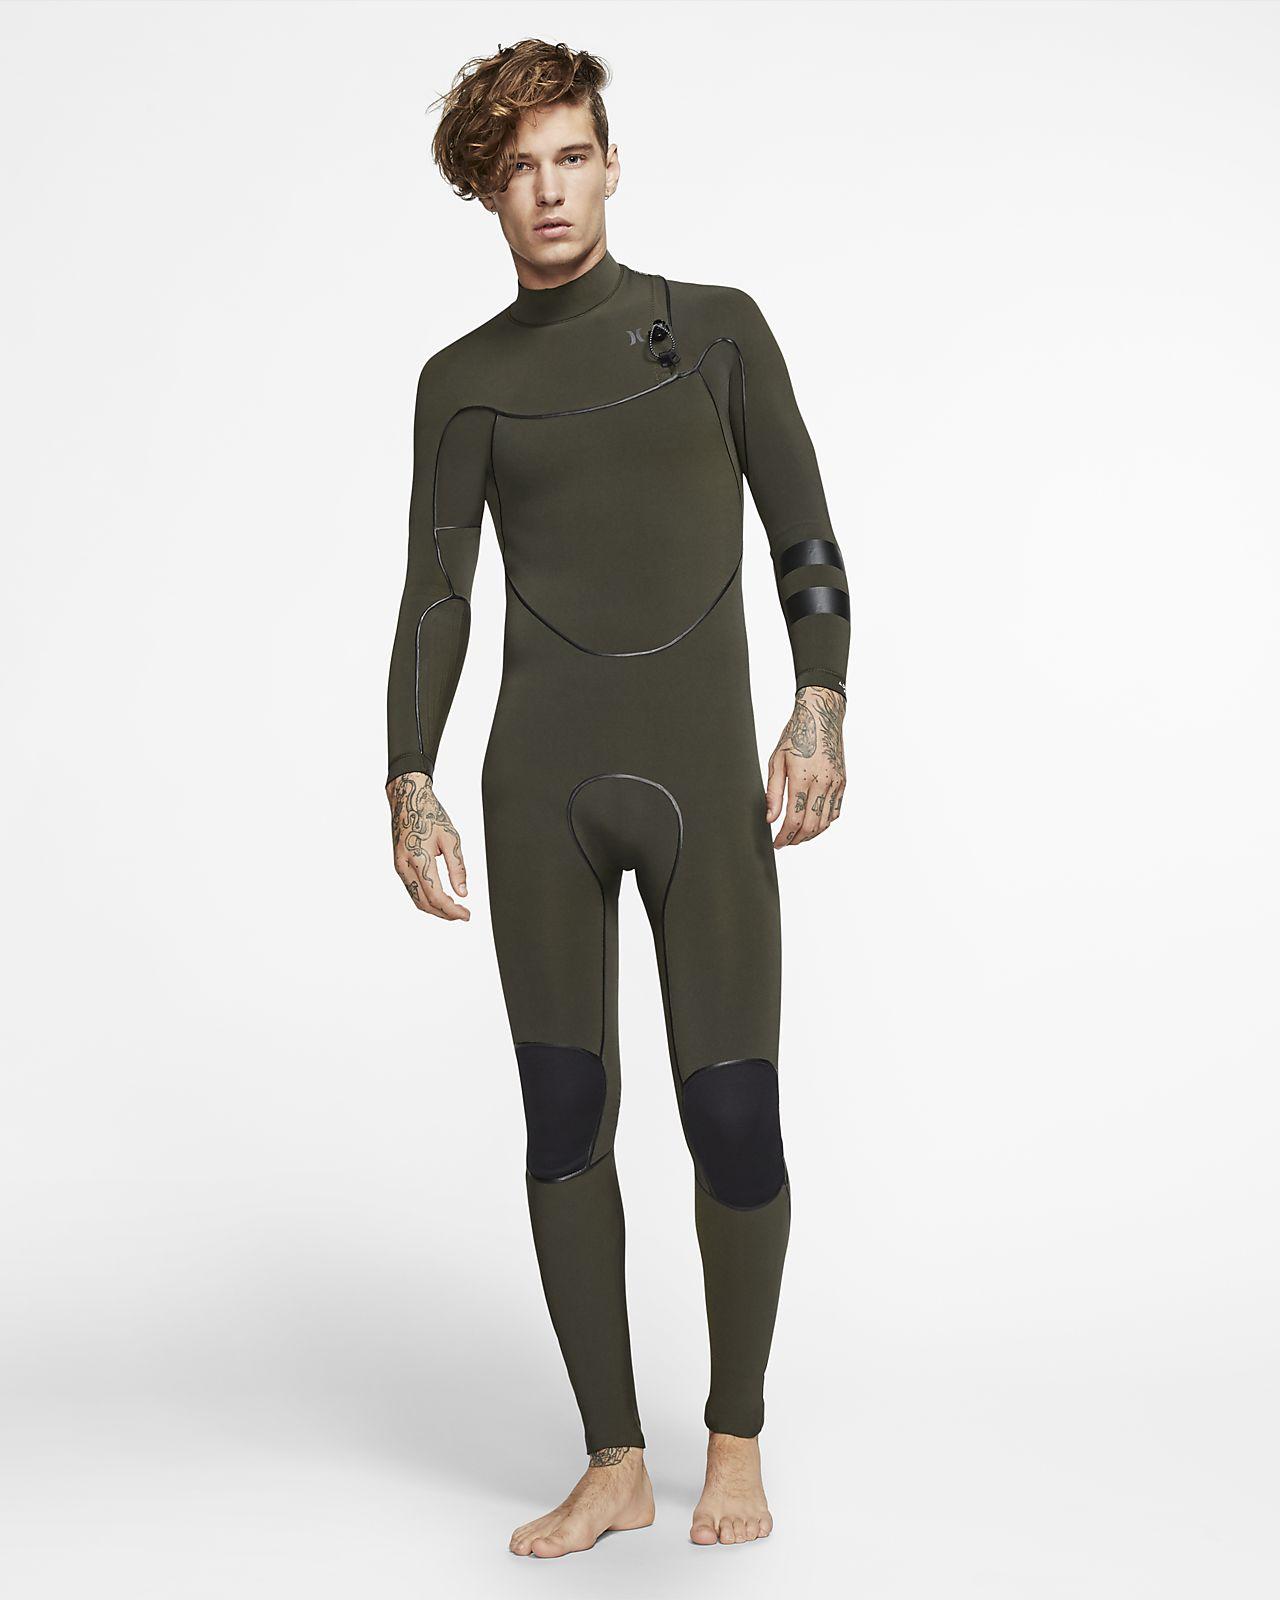 Fato de surf Hurley Advantage Max 3/2mm Fullsuit para homem